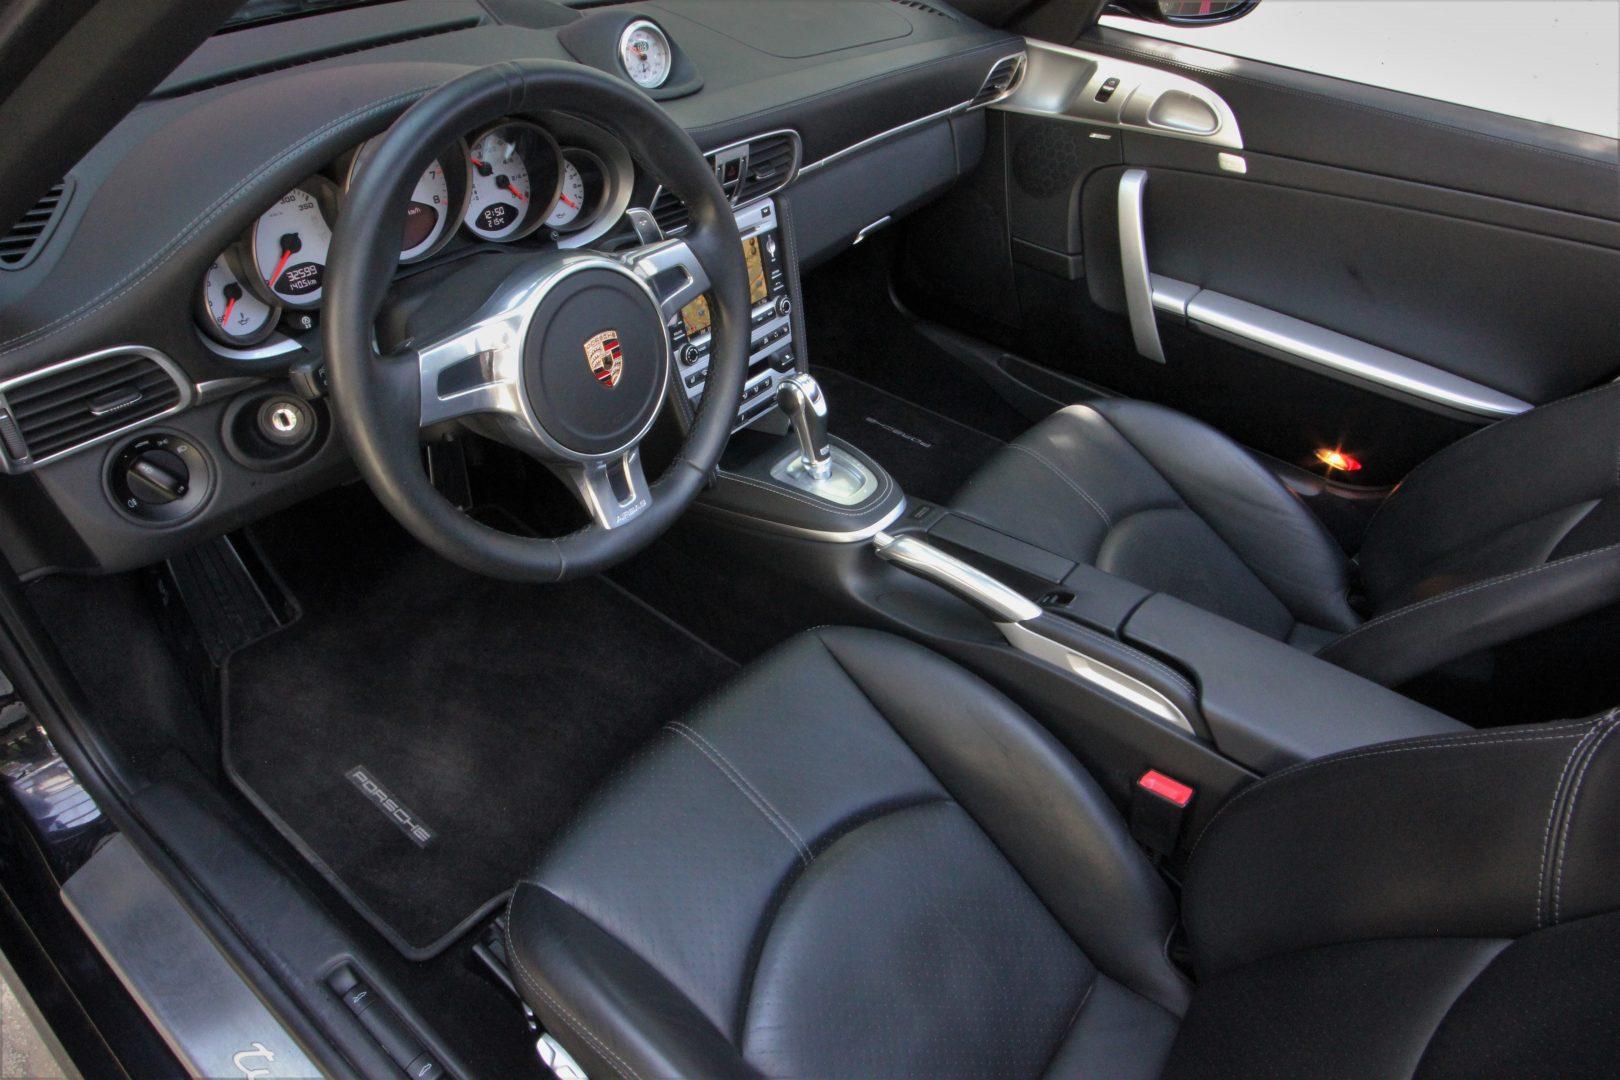 AIL Porsche 911 997 Turbo S PCCB Bose PDK 2